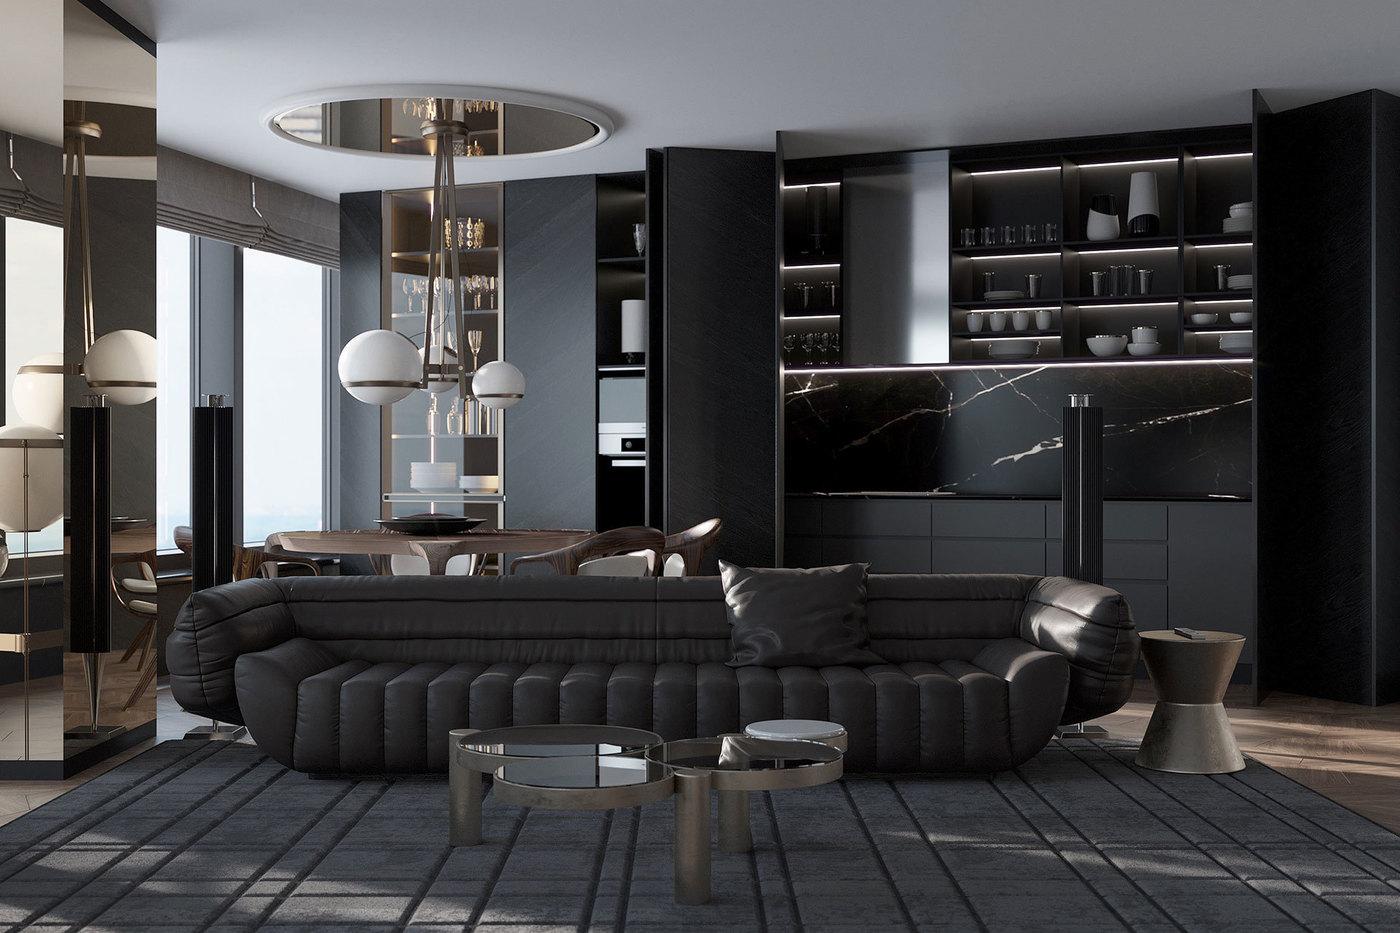 Tactile Baxter Couch by Vincenzo de Cotiis in Interior - Elizarova Design Studio